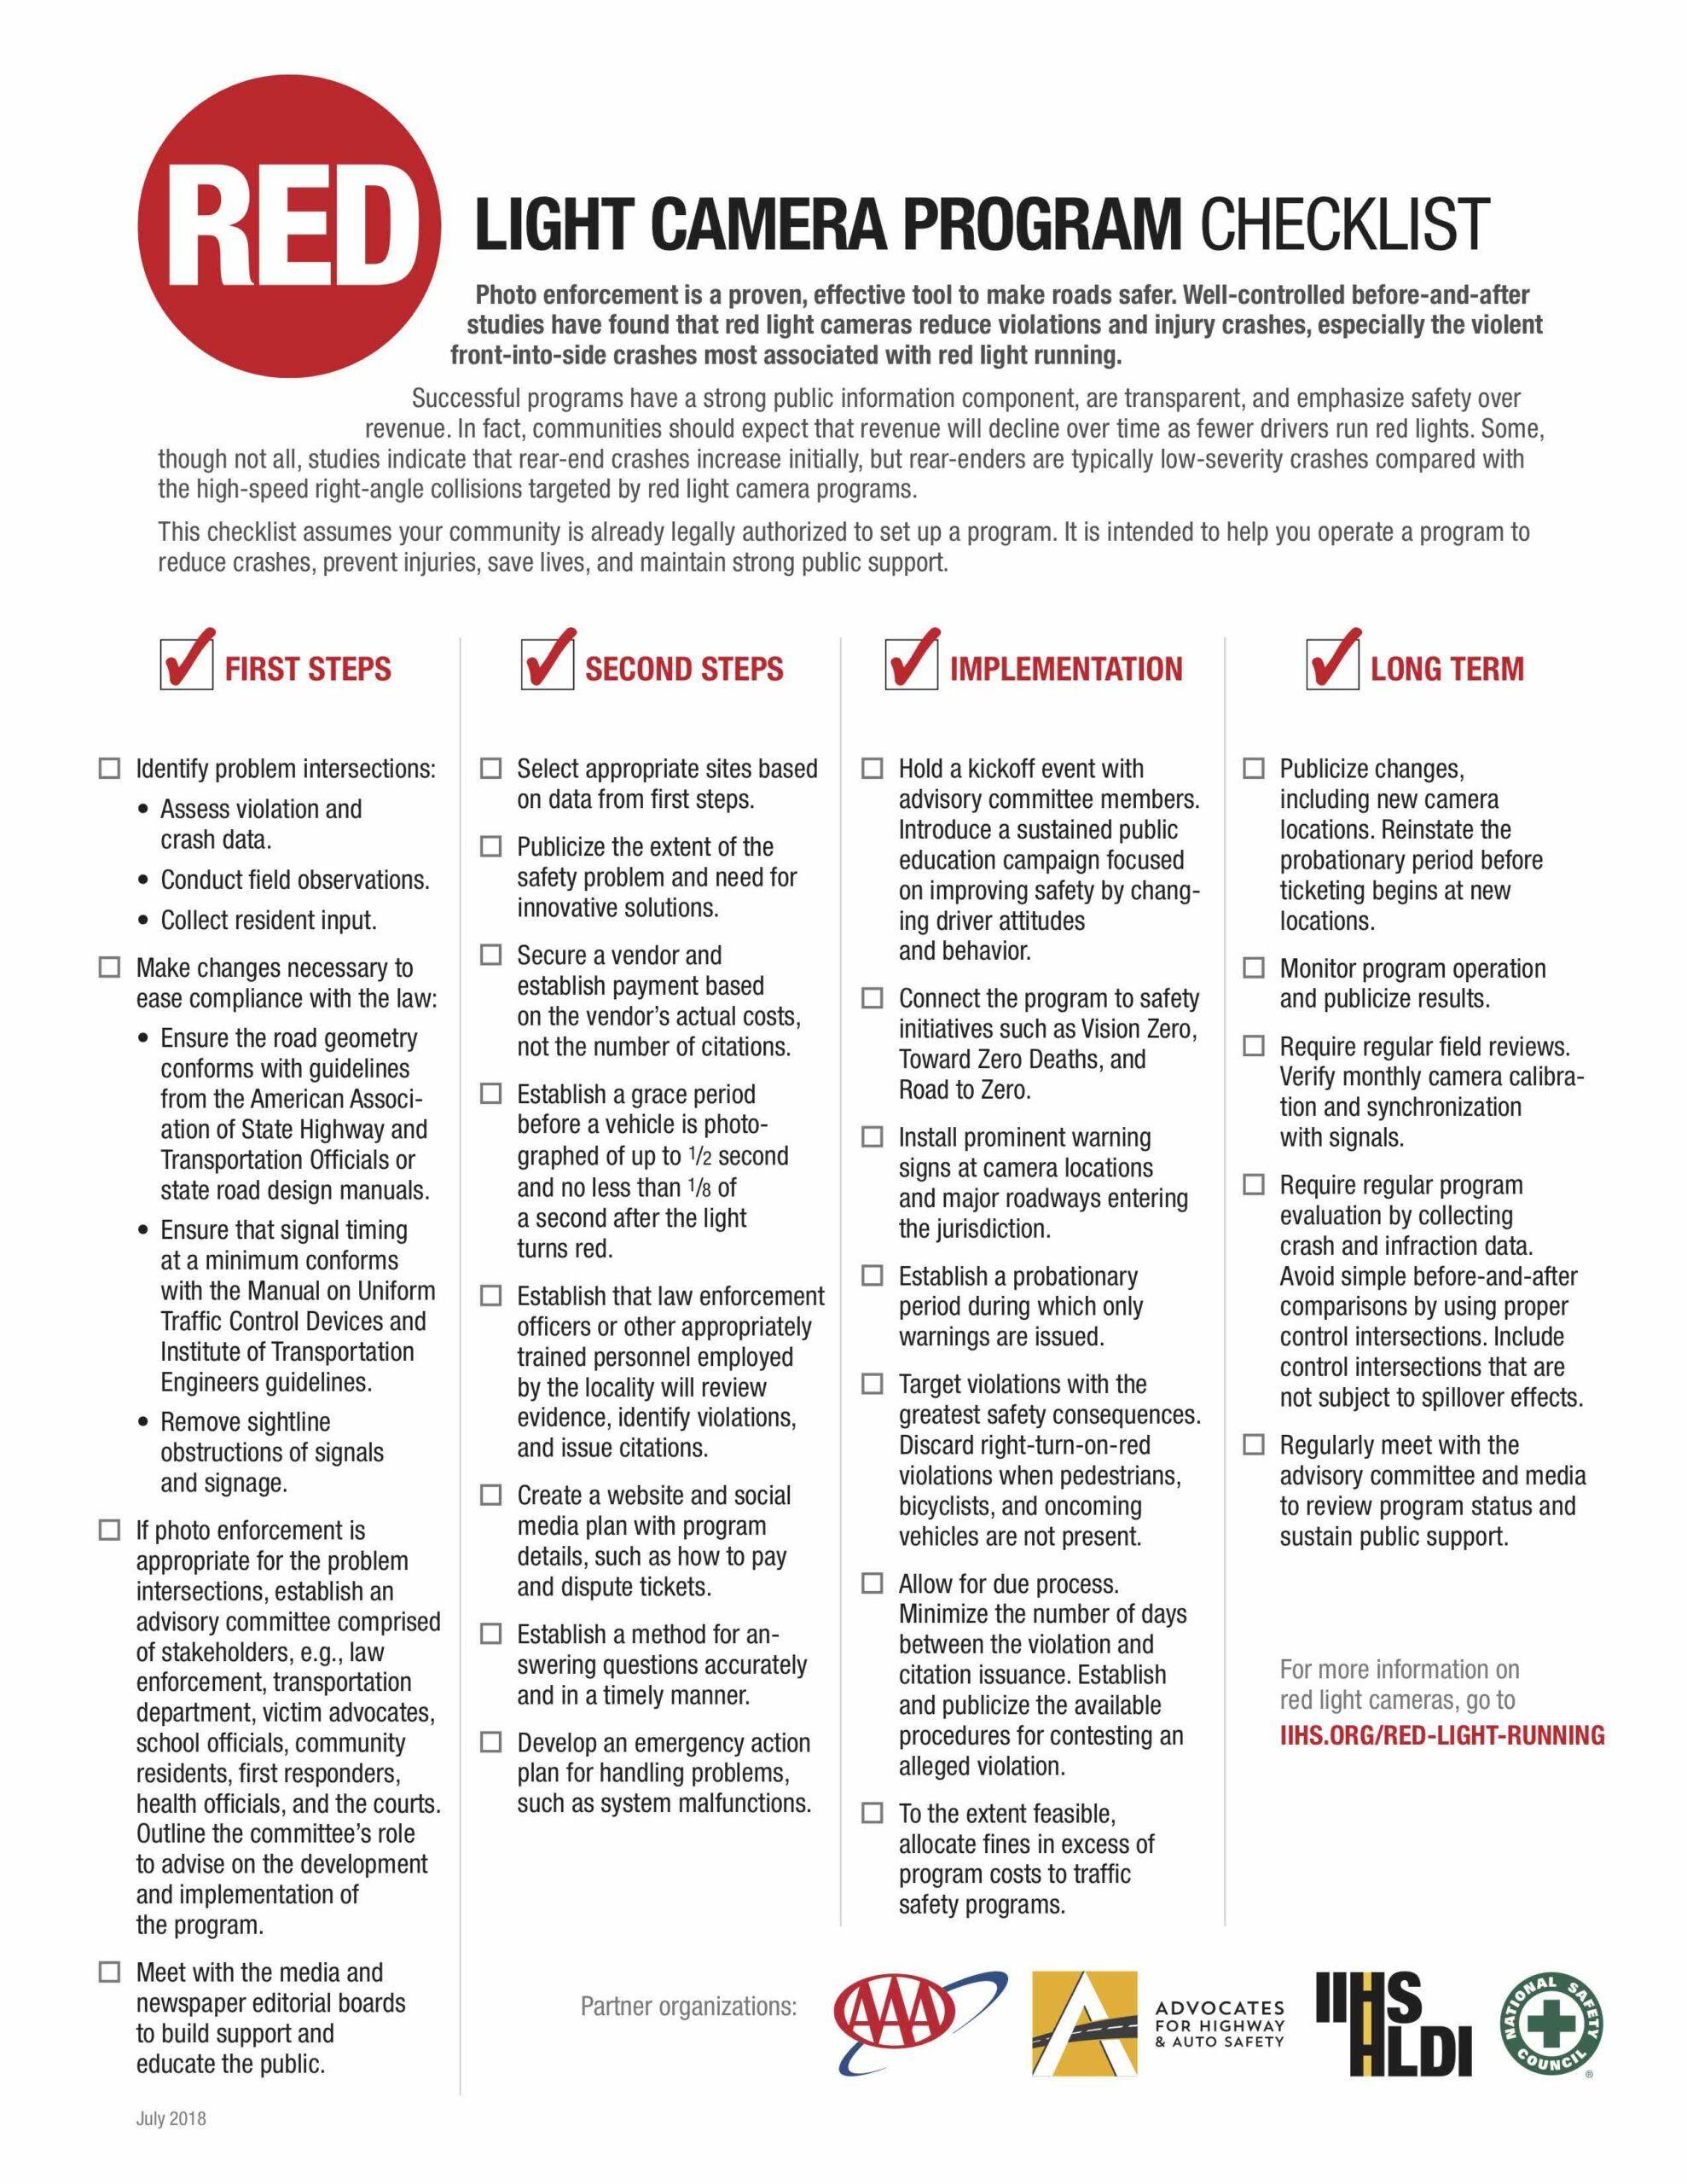 Checklist of how to start of red light program